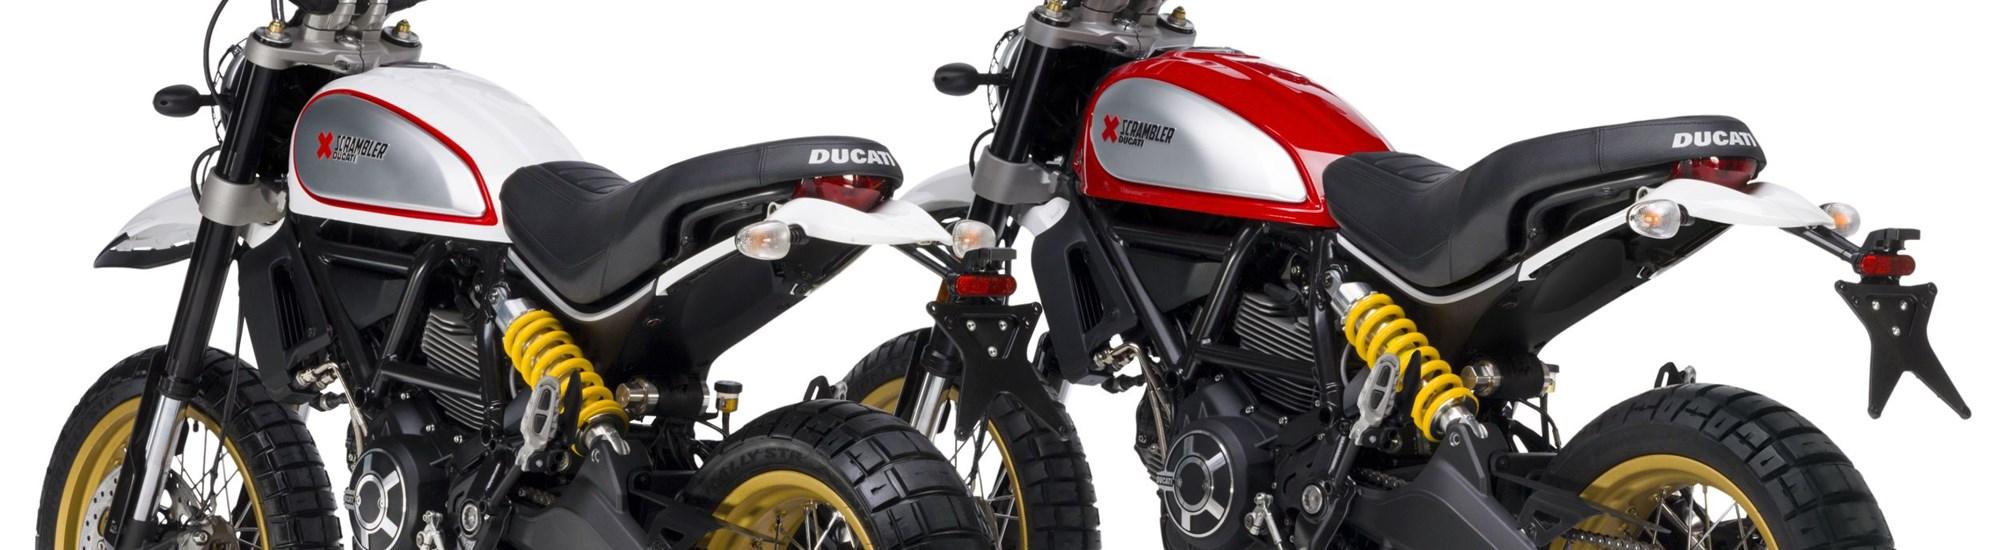 Rexxer Tuning Ducati Scrambler